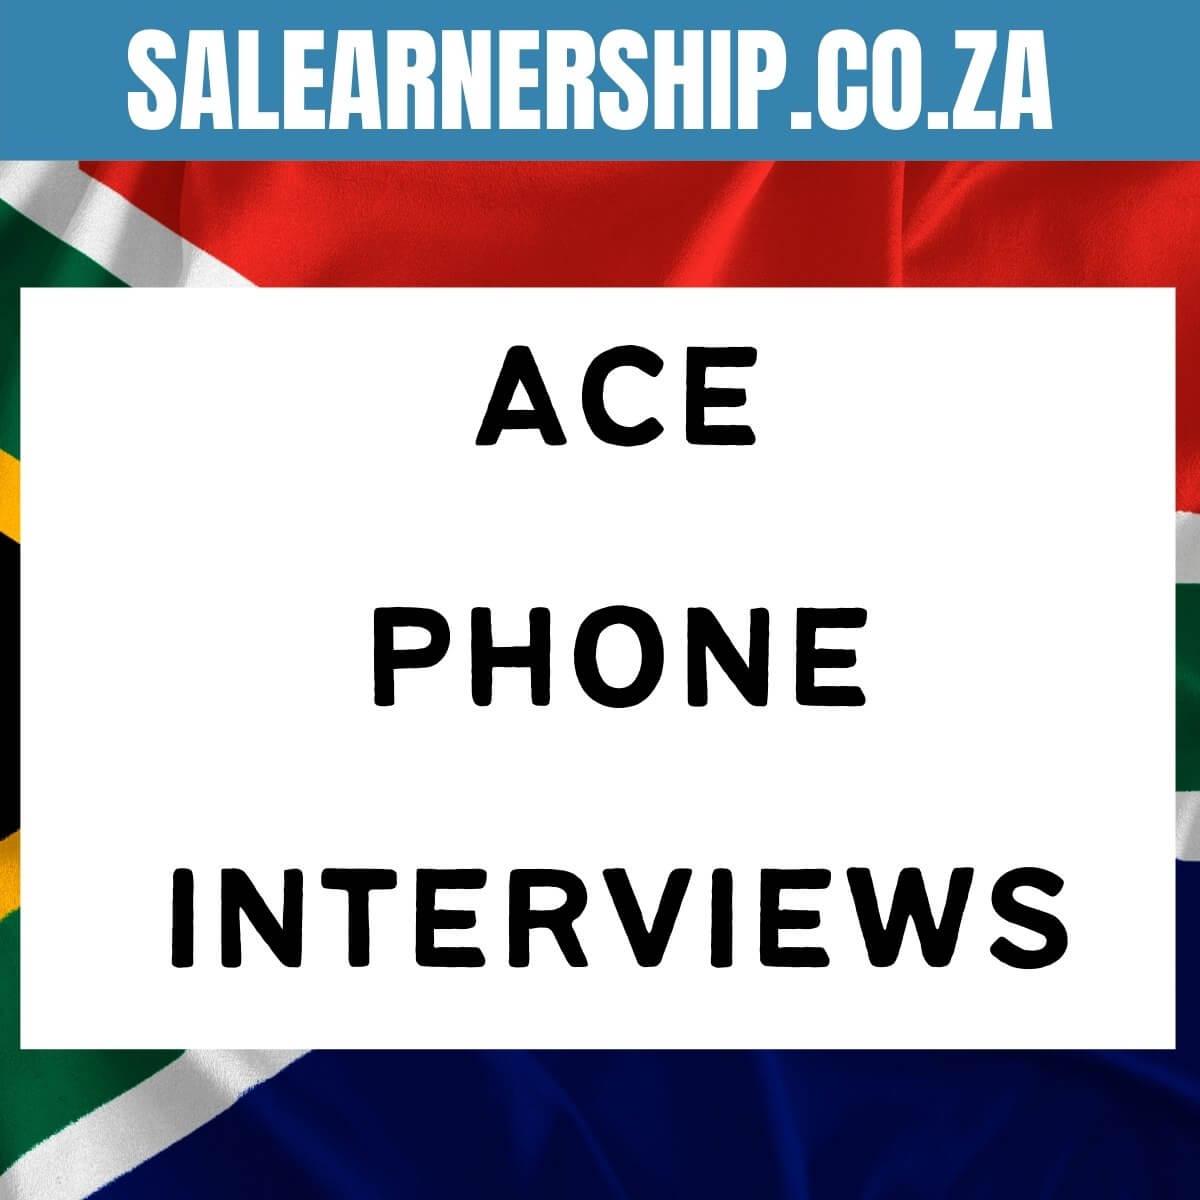 ace phone interviews